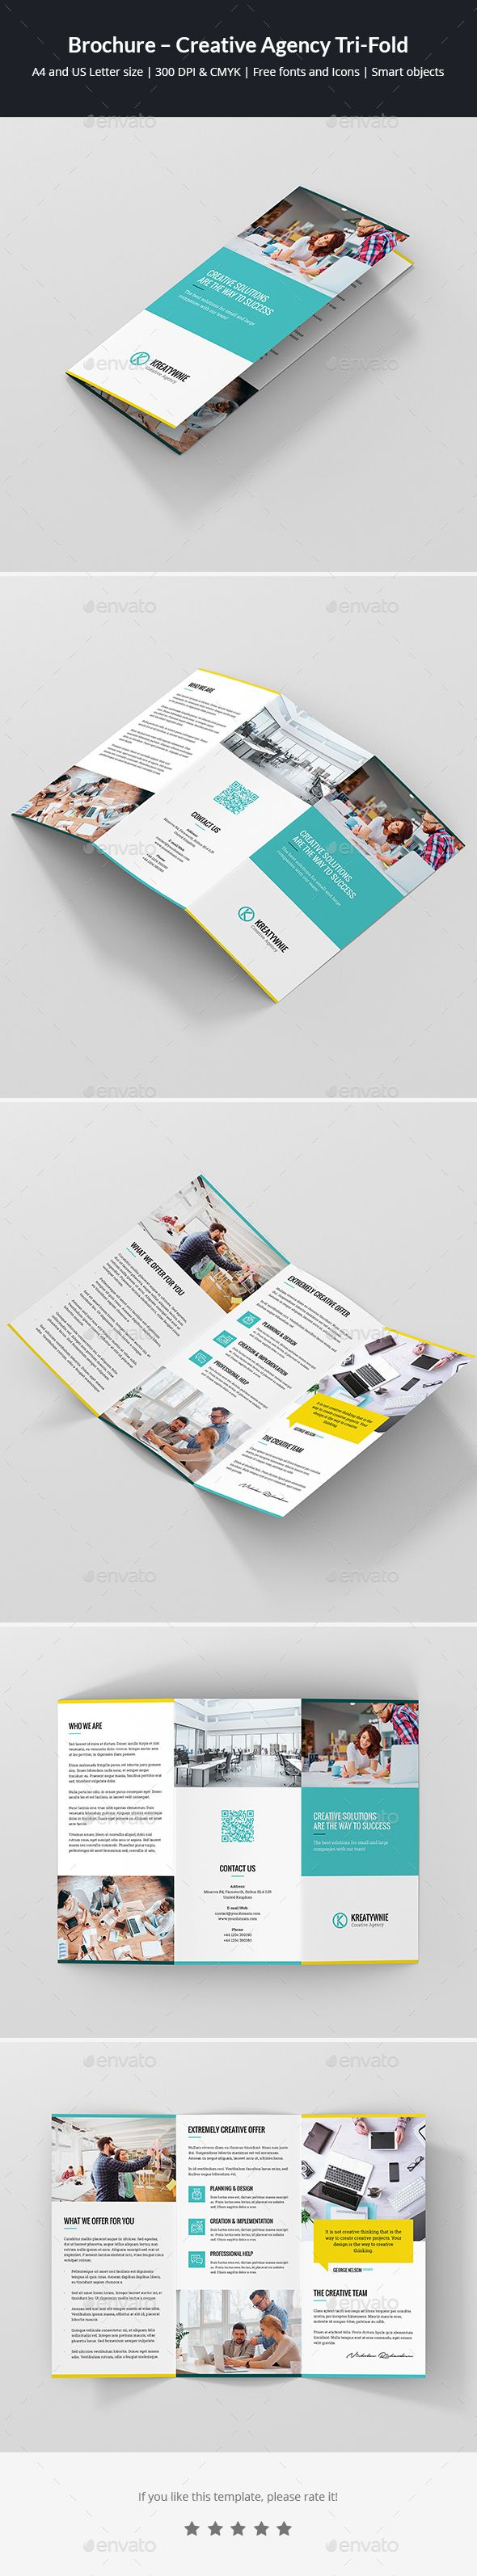 Letter Size Tri Fold Brochure Template - 109 Best Brochure Images On Pinterest